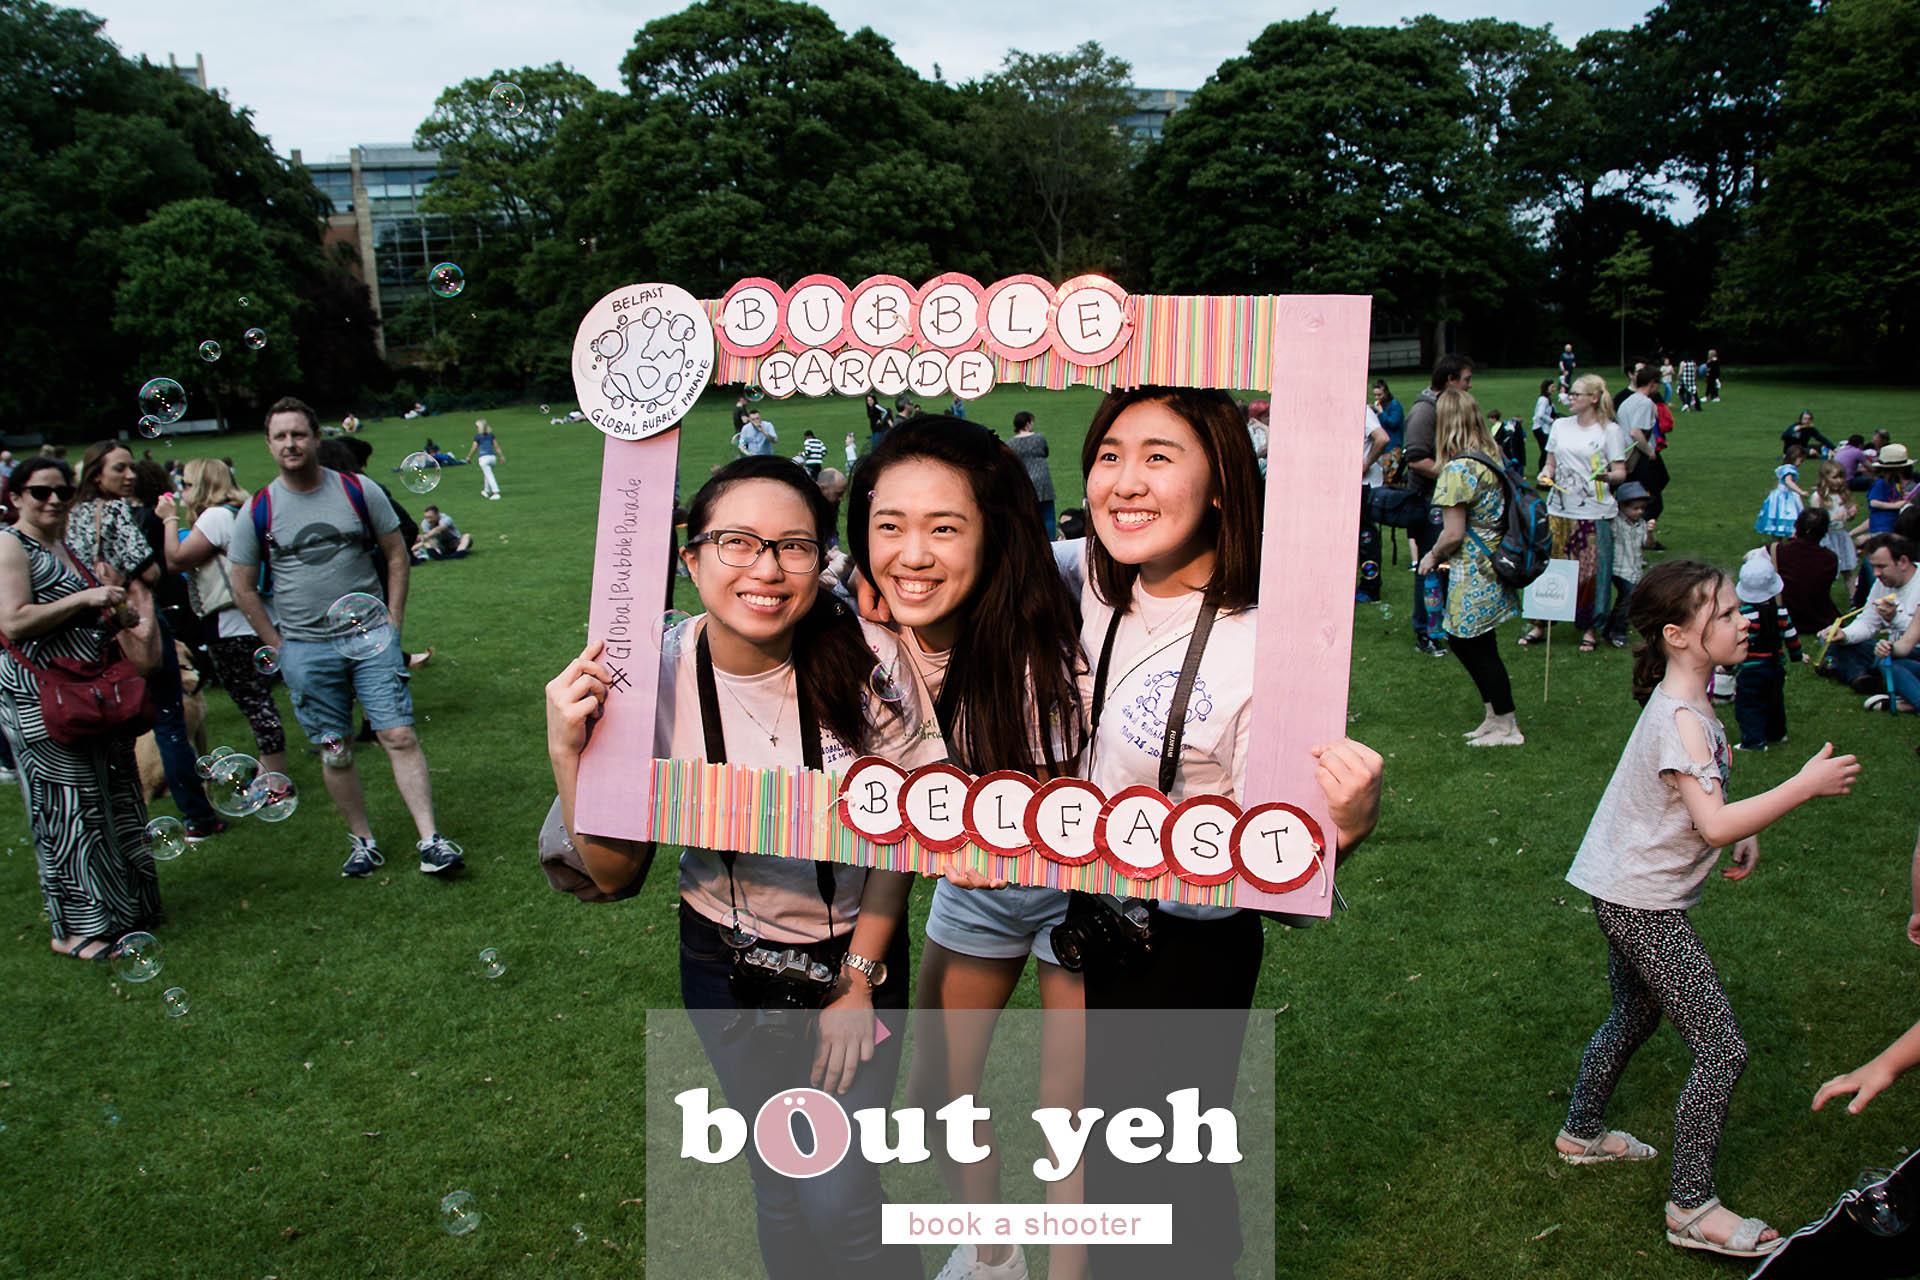 Jiexi, Liz and Gwendoline, Global Bubble Parade Belfast 2017 at Botanic Gardens, Belfast, Northern Ireland - photo 6849.